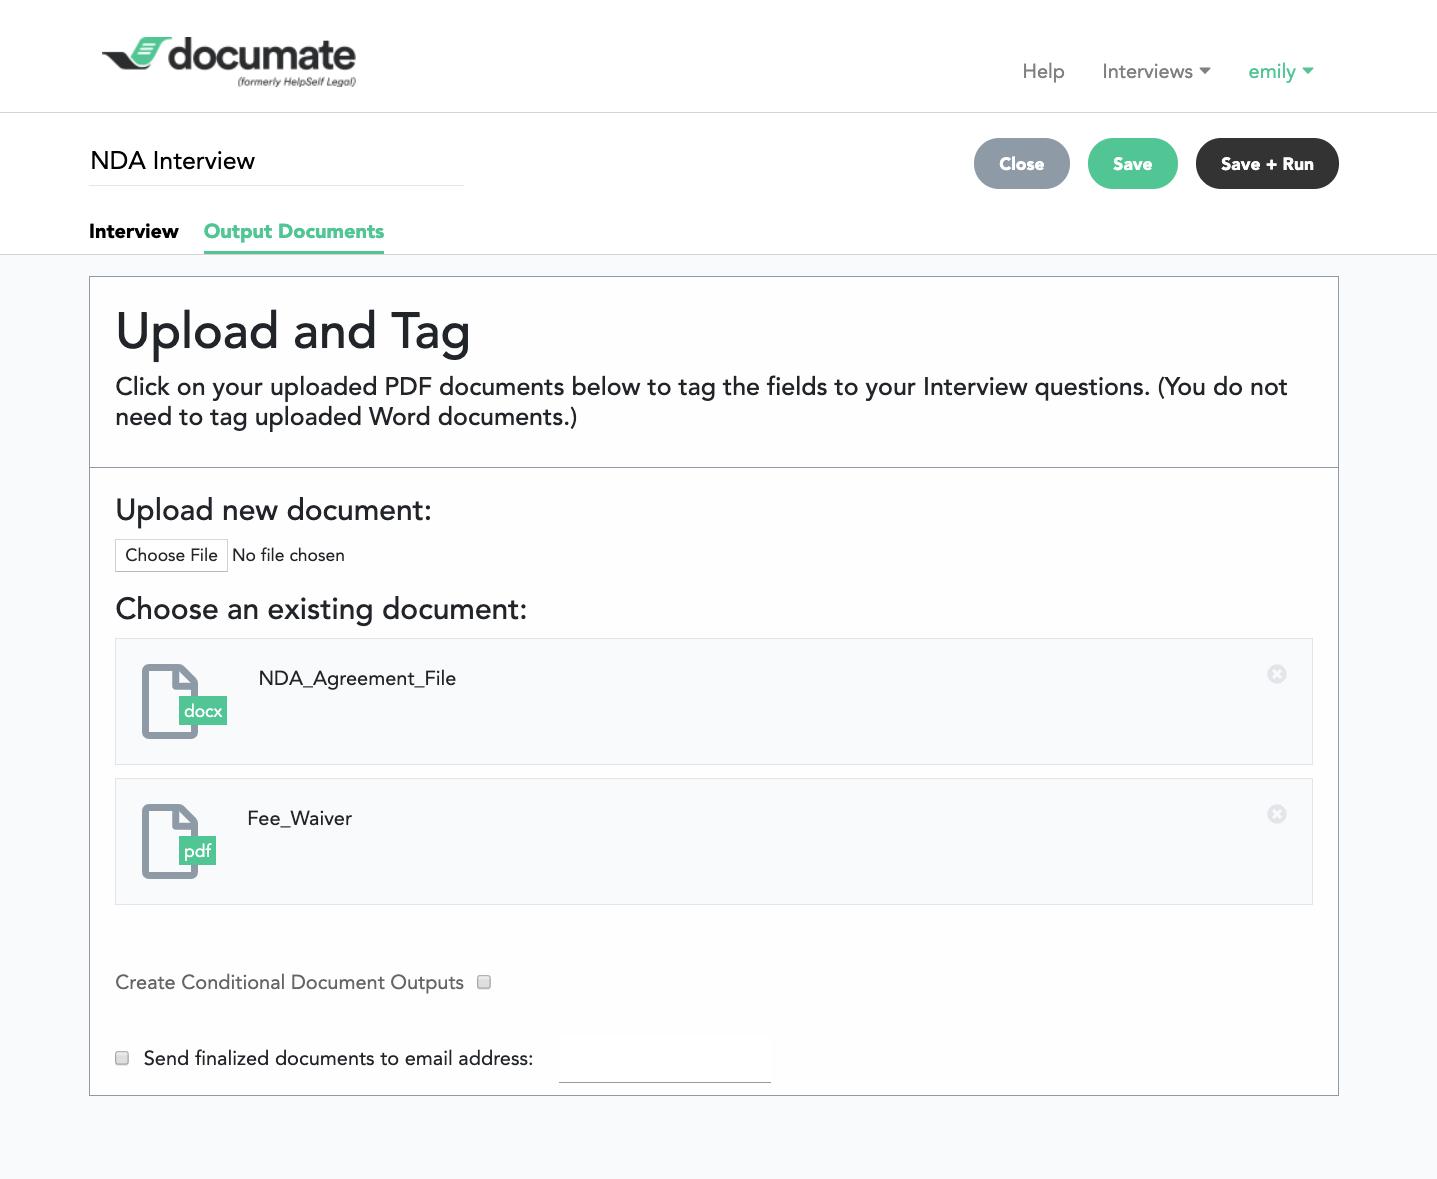 Documate output documents